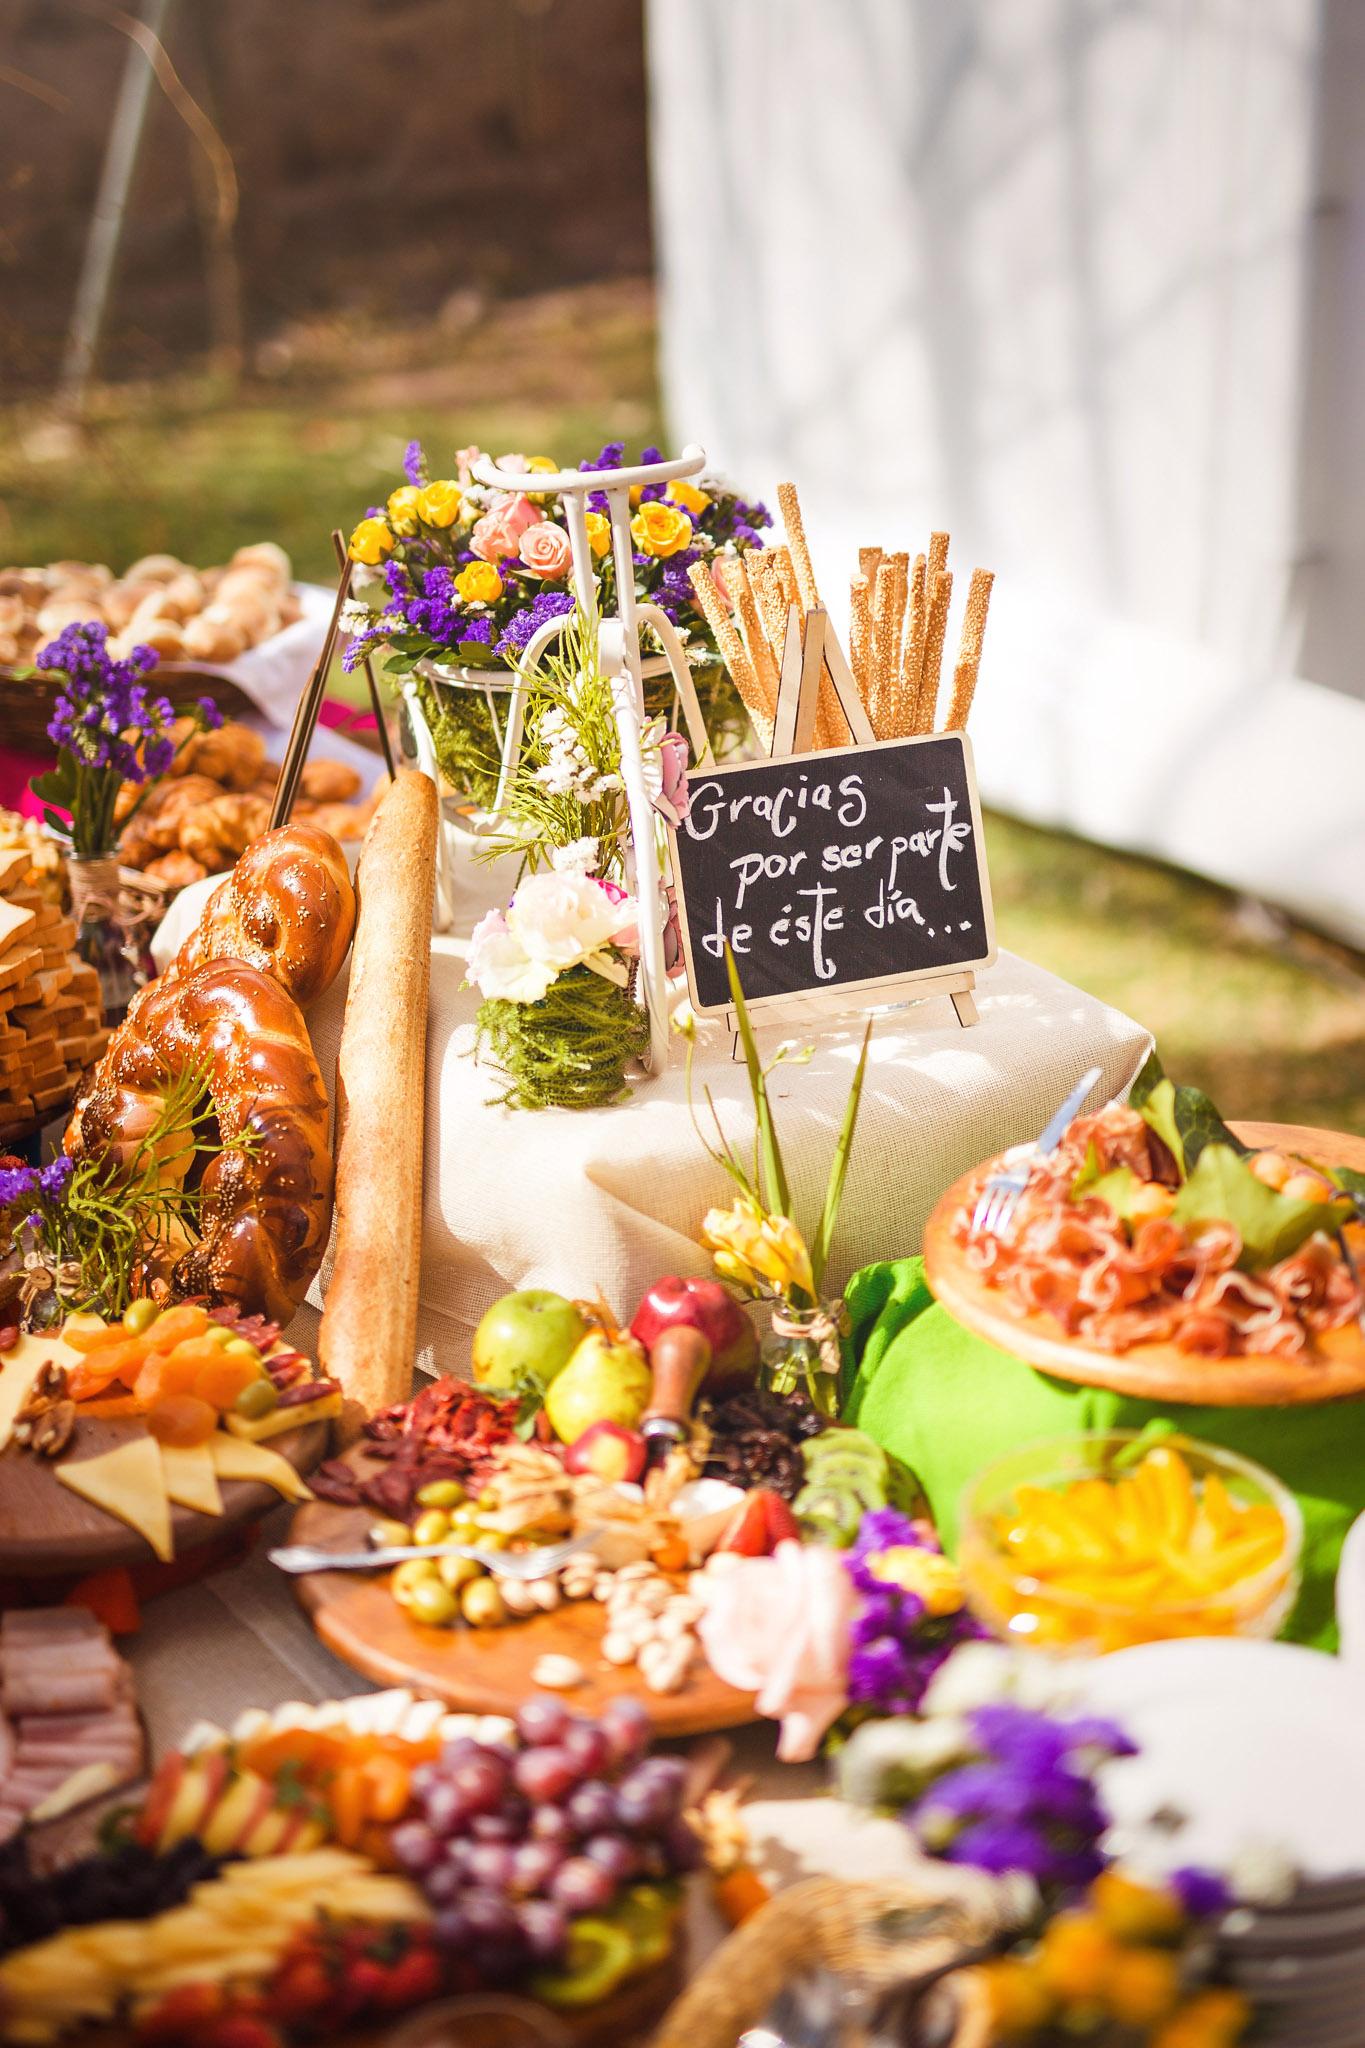 Wedding-Travellers-Destination-Wedding-Peru-Cusco-Hacienda-Sarapampa-Sacred-Valley-reception-finger-food